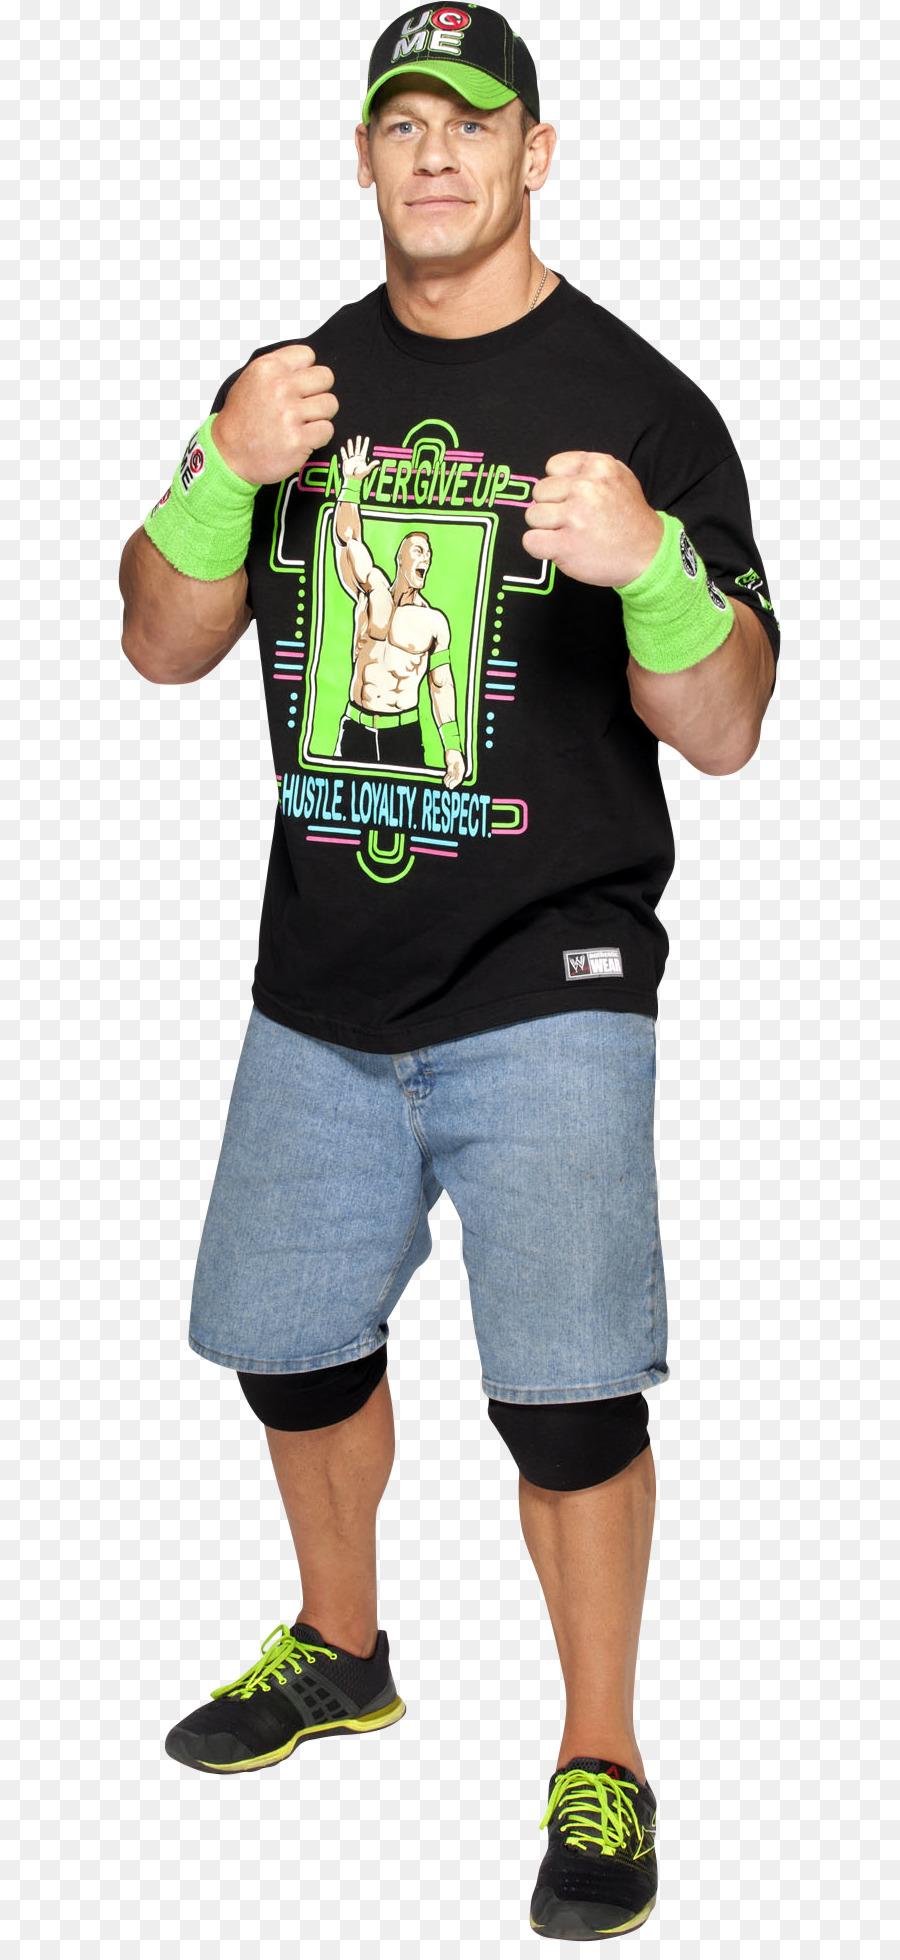 John Cena Wwe Superstars Papier Peint De Bureau De Télévision En